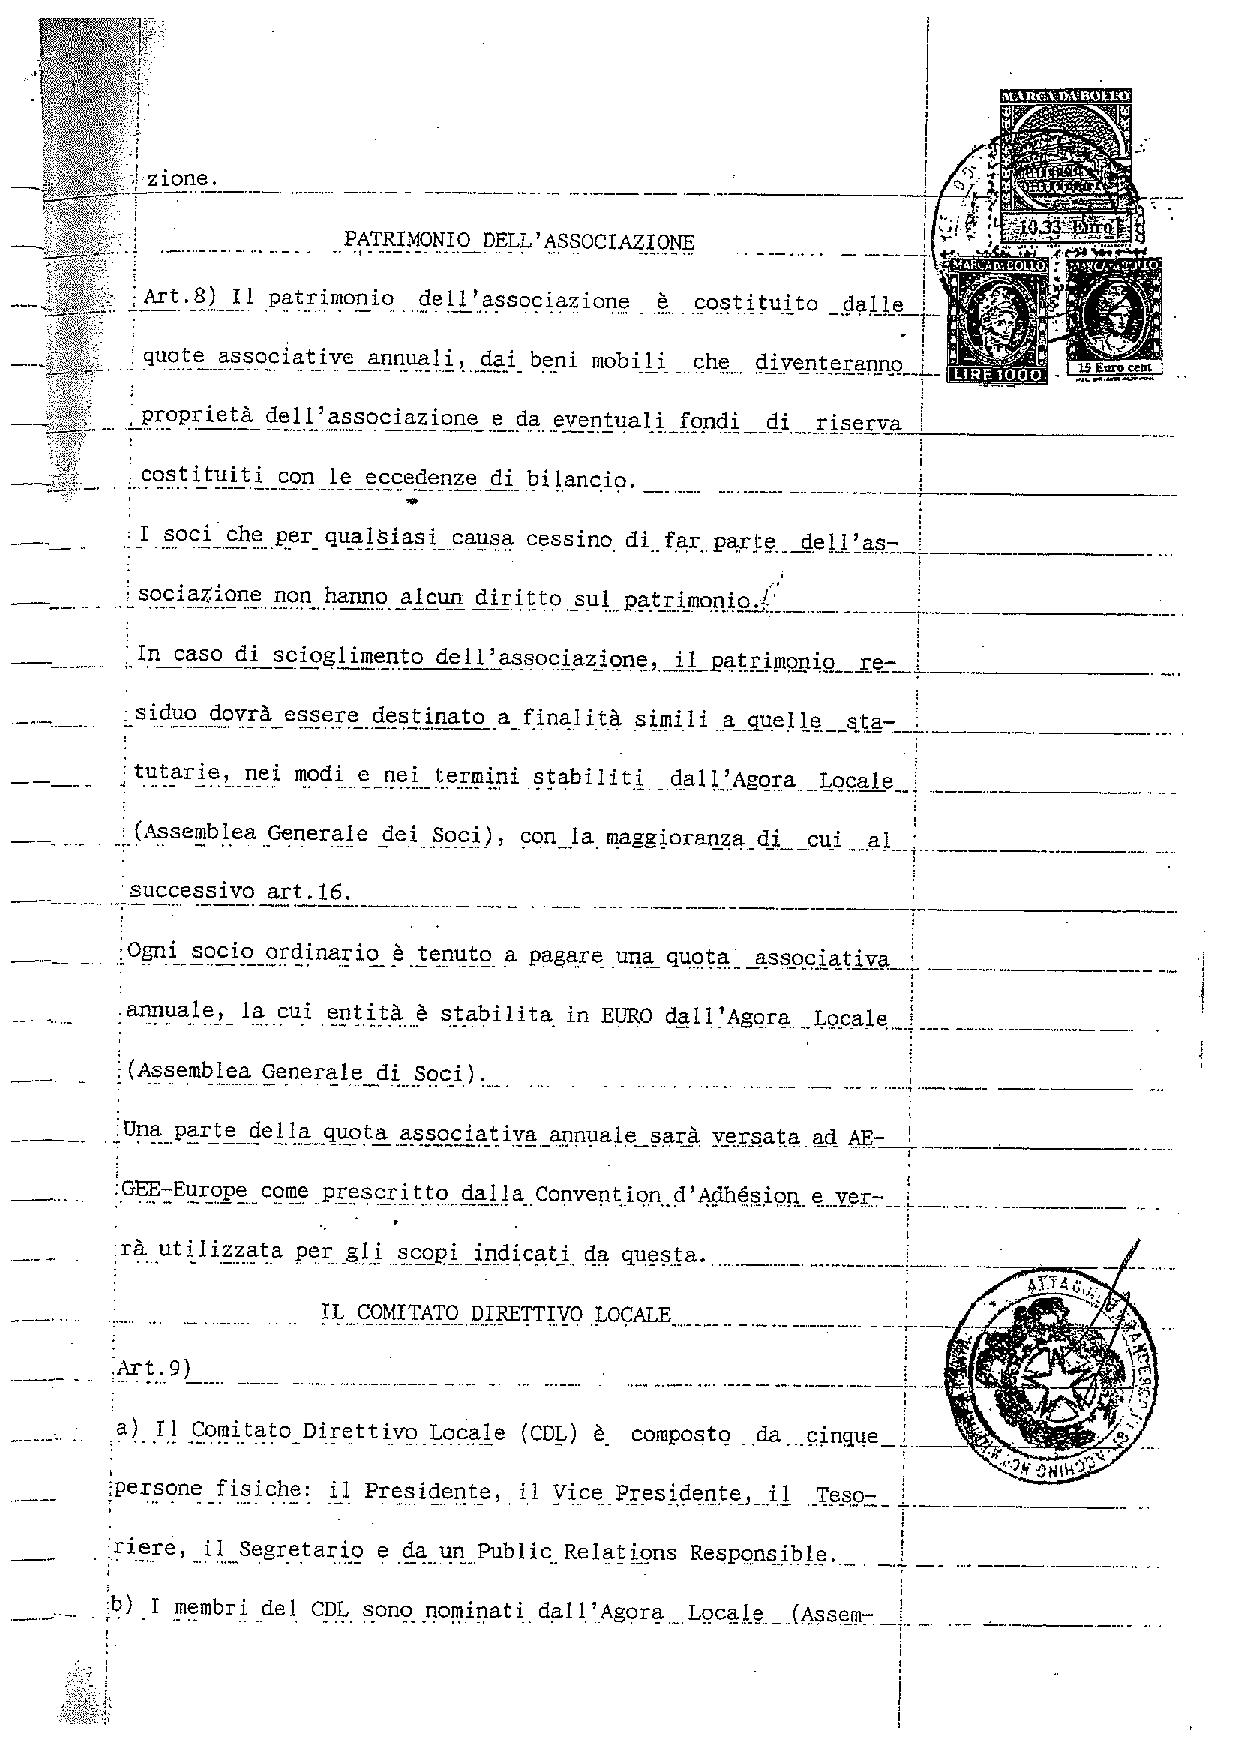 statuto-aegee-catania-page-005